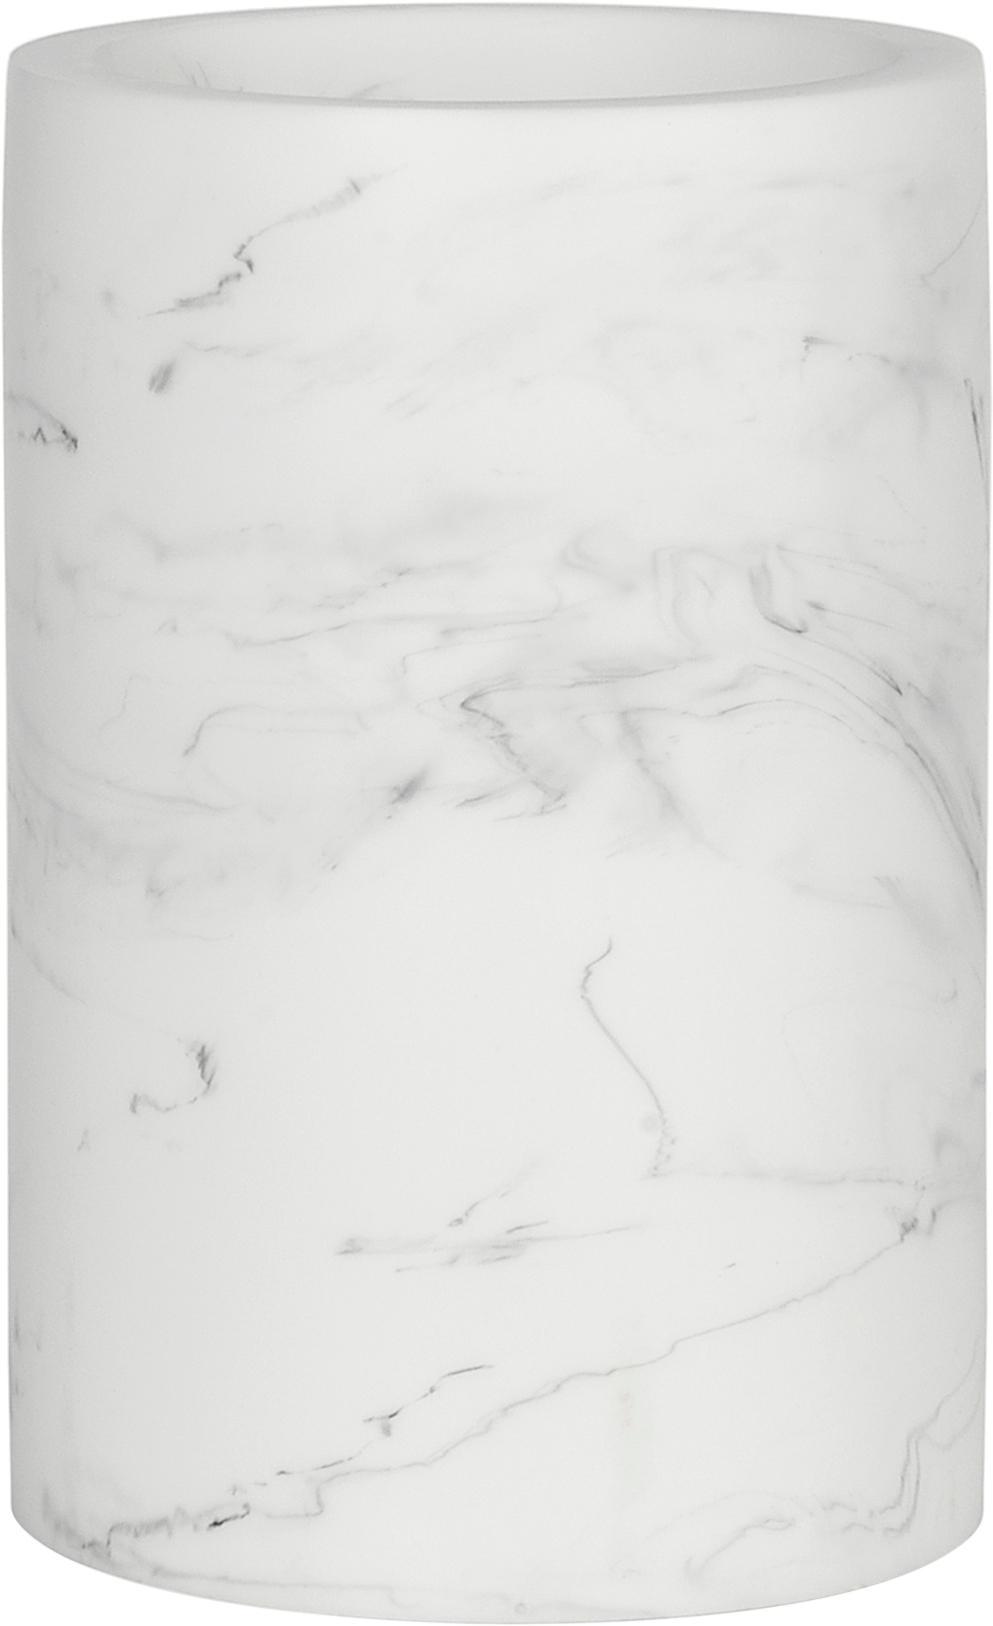 Porta spazzolini Swan, Materiale sintetico (poliresina), Bianco marmorizzato, Ø 7 x Alt. 11 cm